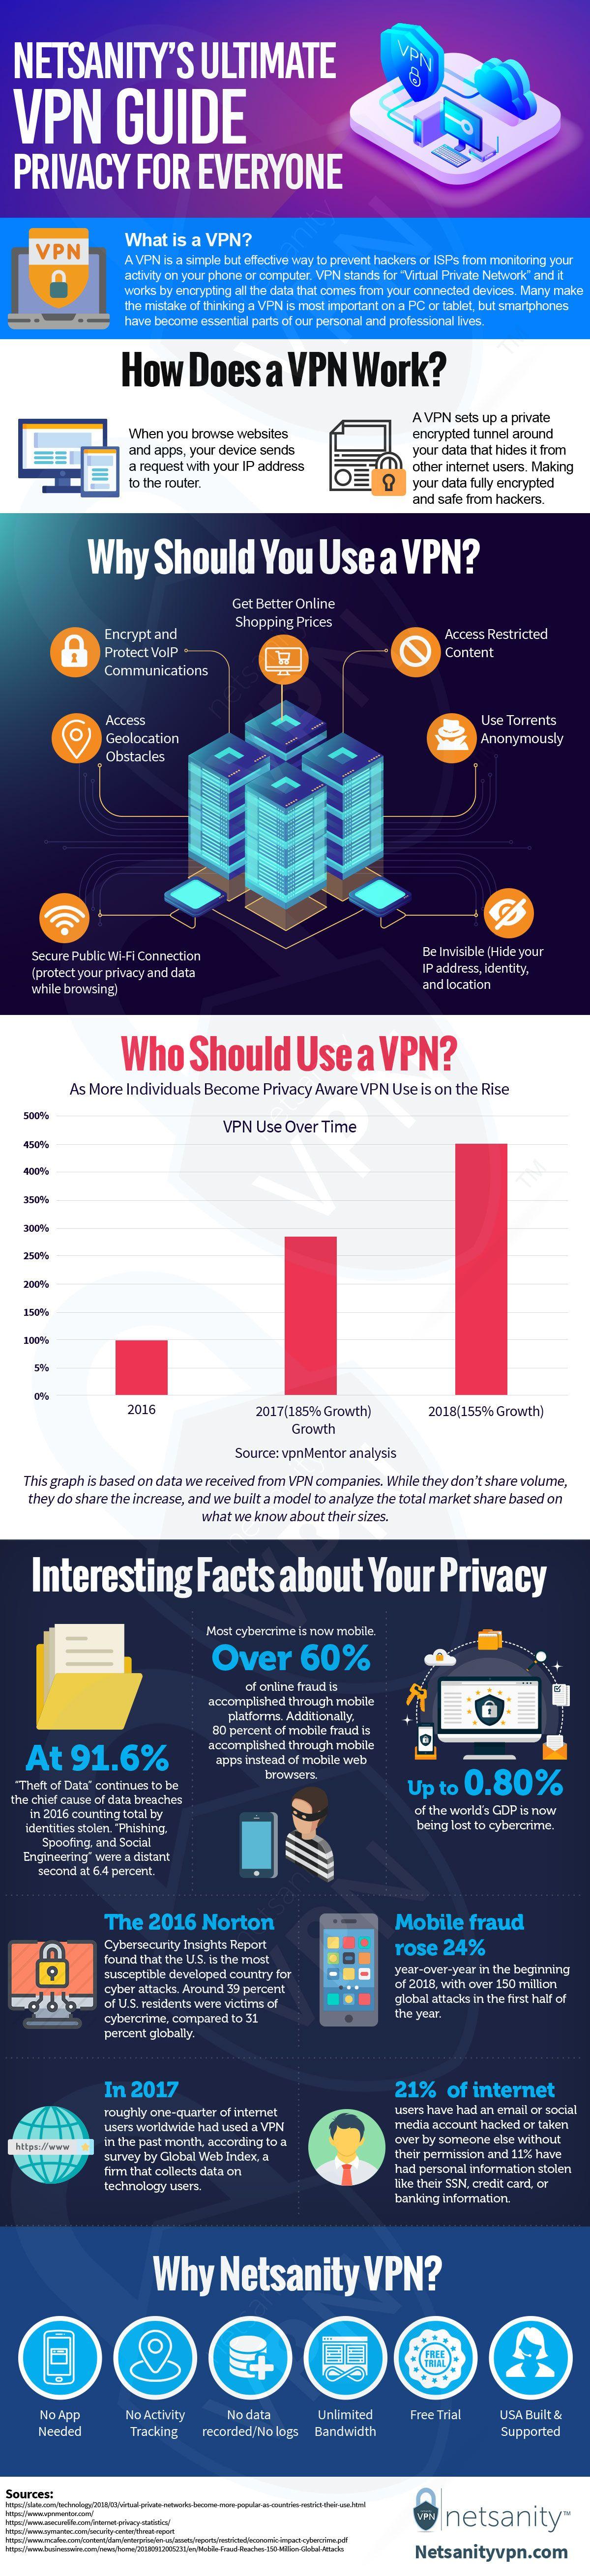 9a8d6f2eef337553a682f27636f7af91 - How Does A Vpn Protect Privacy